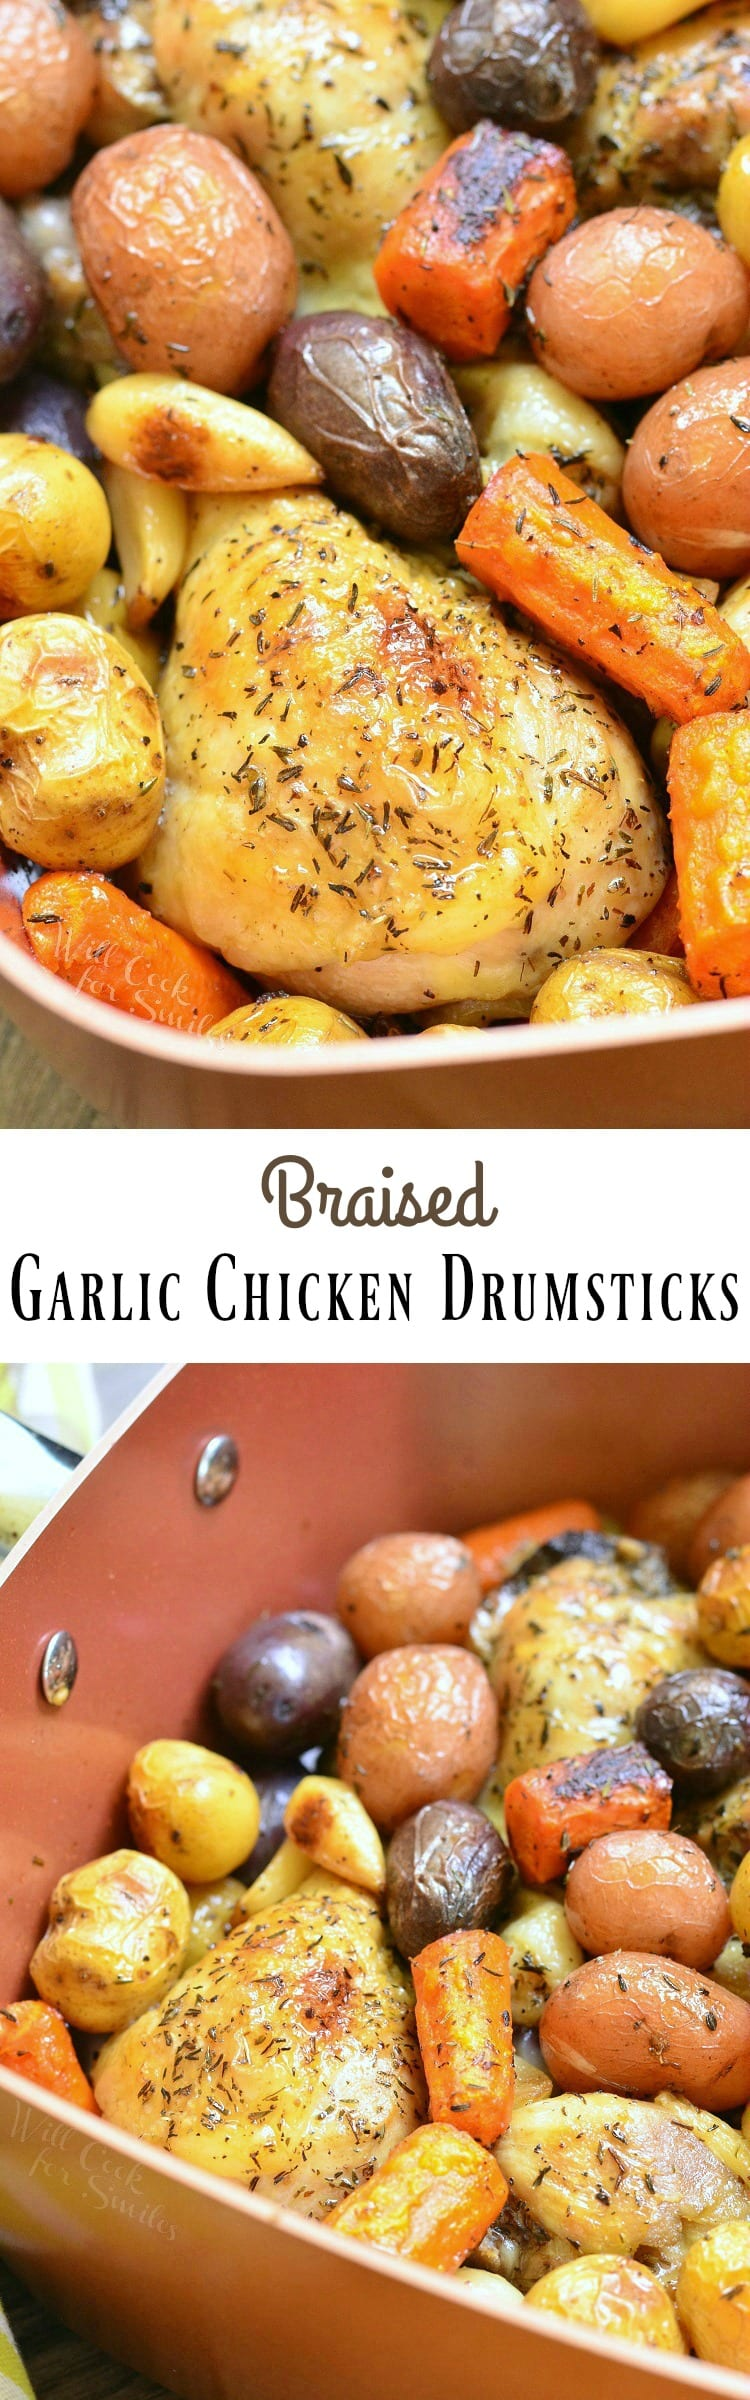 Braised Garlic Chicken Drumsticks Juicy Tender Chicken Drumsticks Braised And Infused With Garlic And